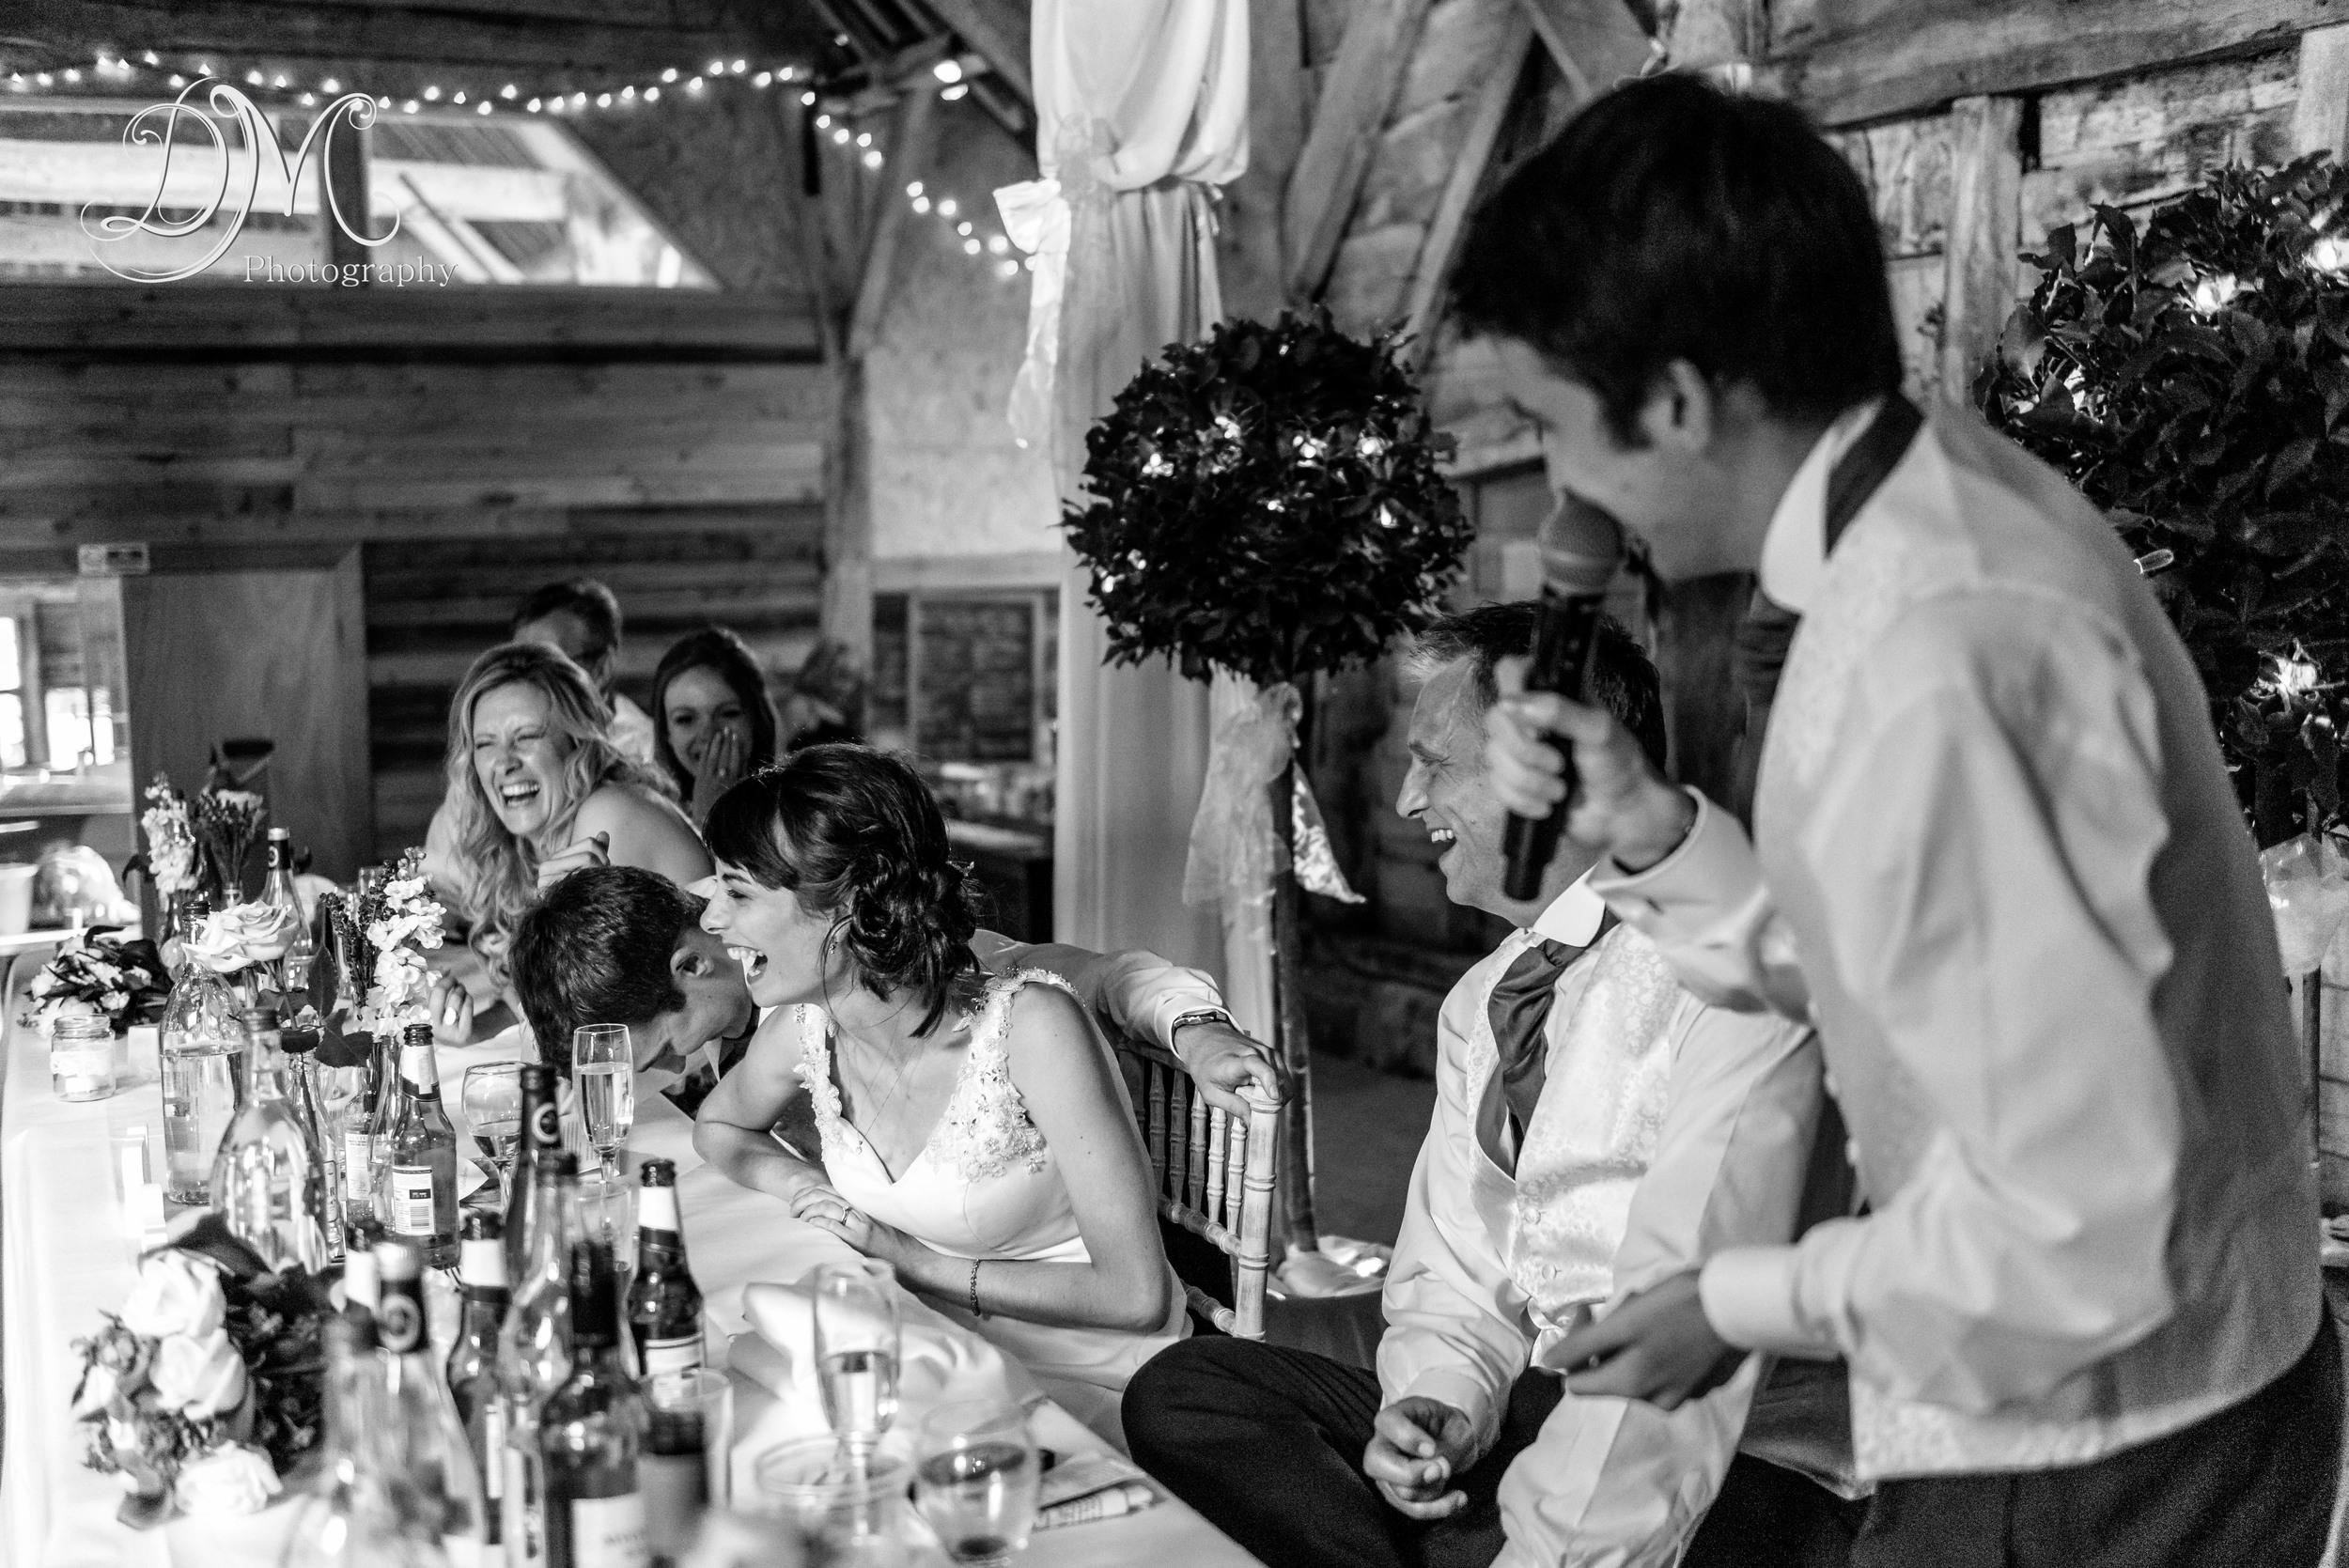 Hampshire, Berkshire, Surrey, Wedding, Warbooke House, Great Fosters, Fleet, Farnborough, Photography, Guildford, Ascot, Alton, Highfield, Northbrook, Bride, groom, Love, Farnham,